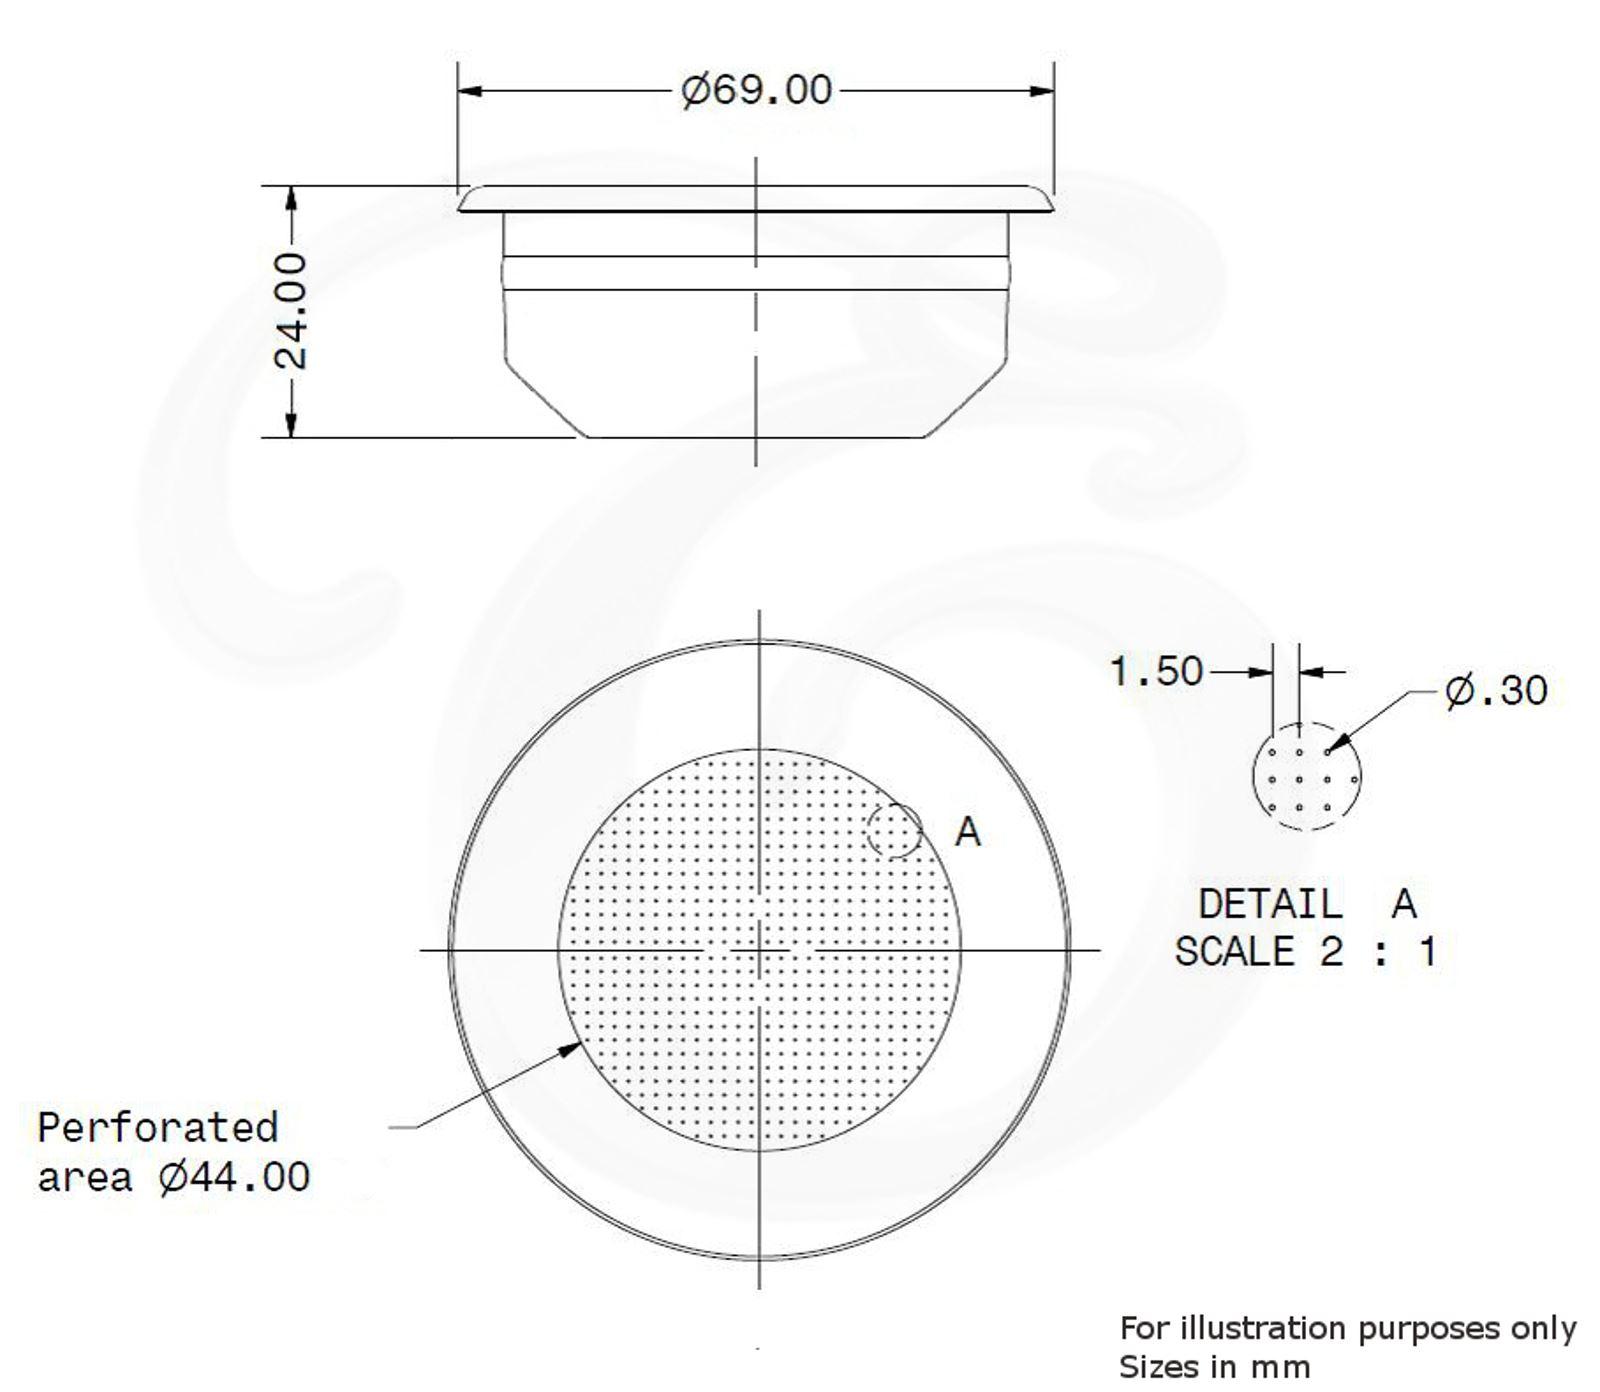 Faema E61 14g Double Shot Replacement Portafilter Basket Coffee Espresso Machine Diagram